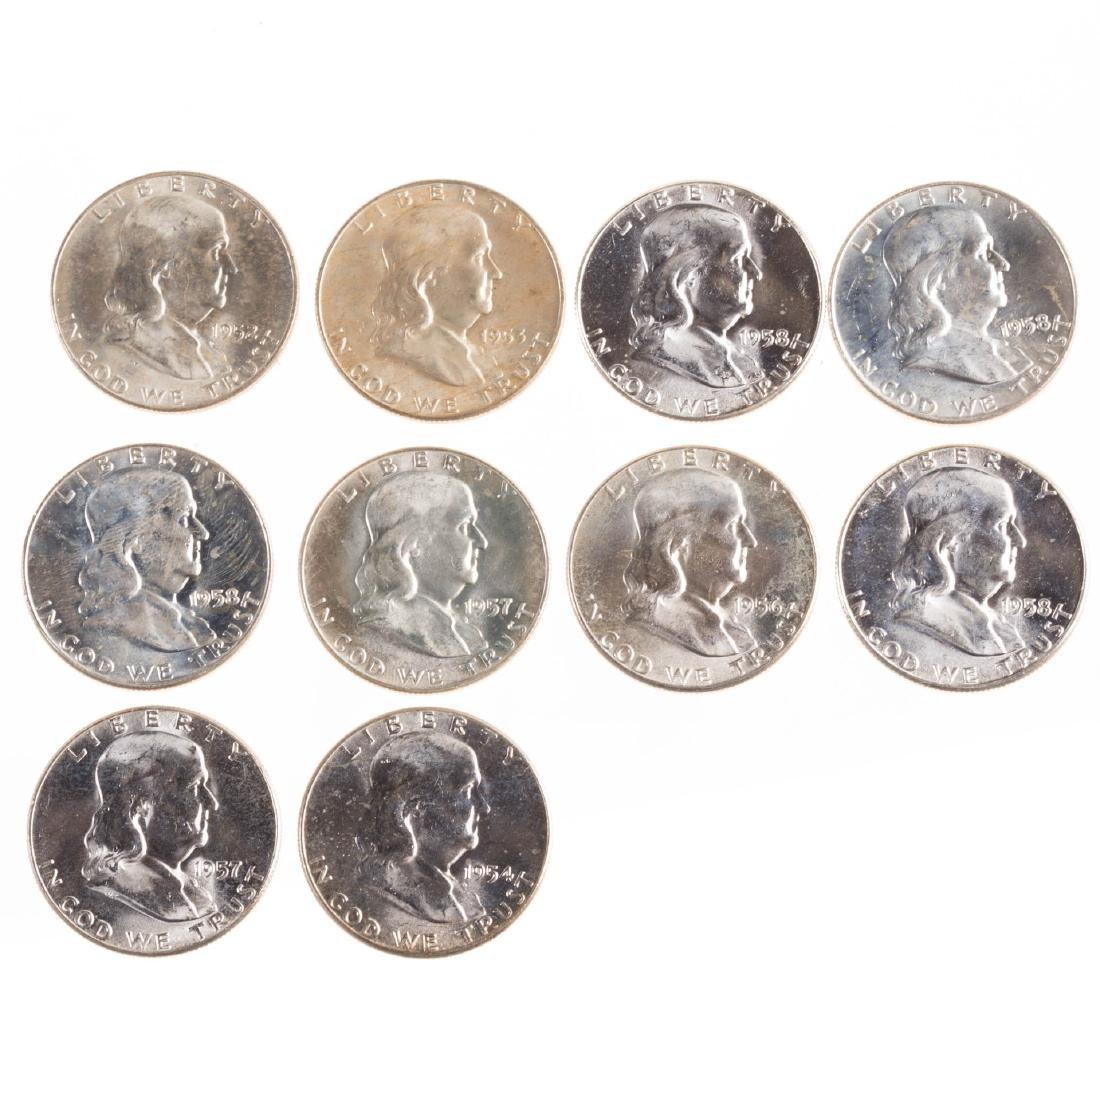 [US] Ten BU Franklin Halves